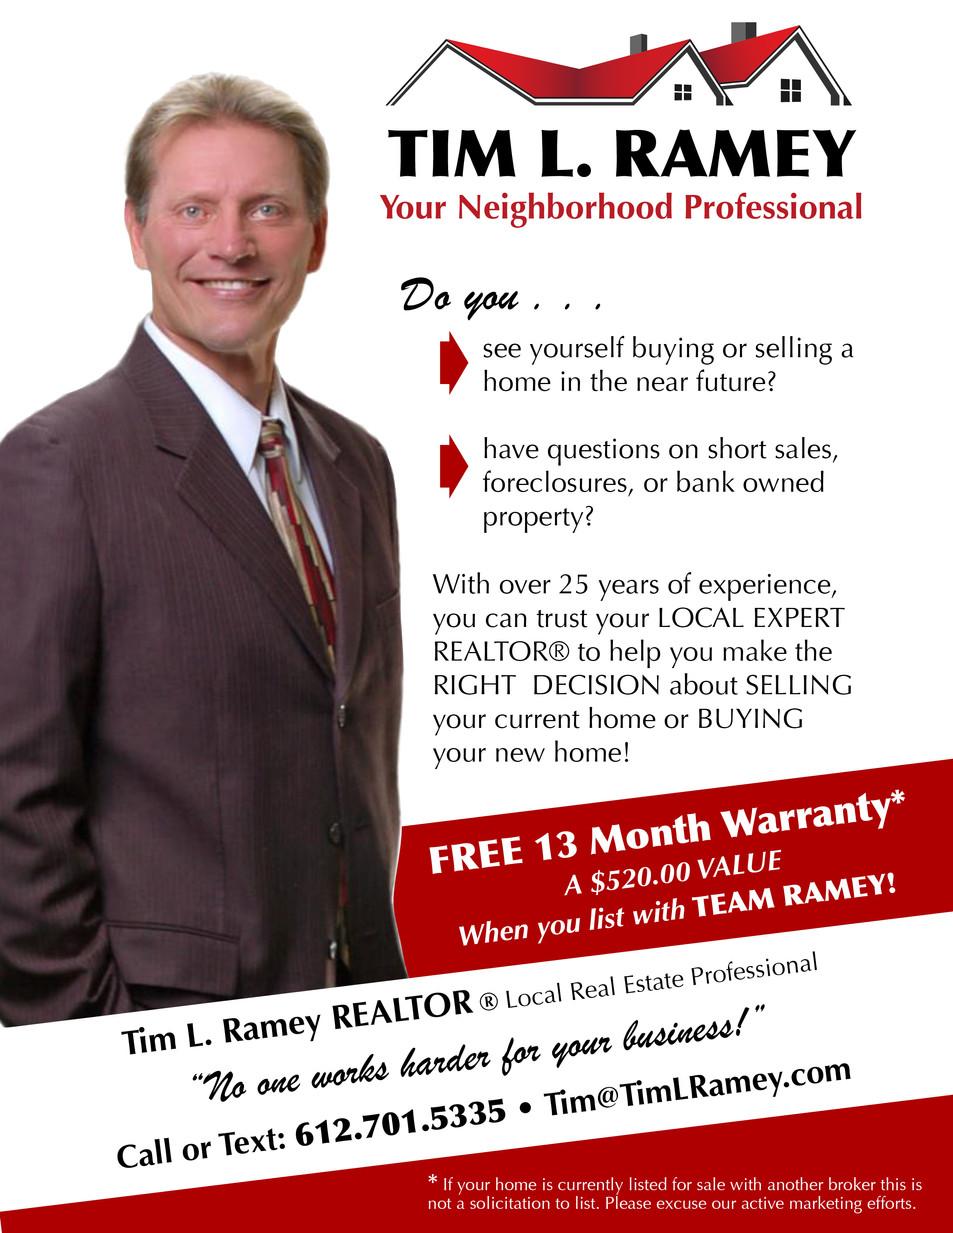 Tim Ramey Flyer 02 copy.jpg